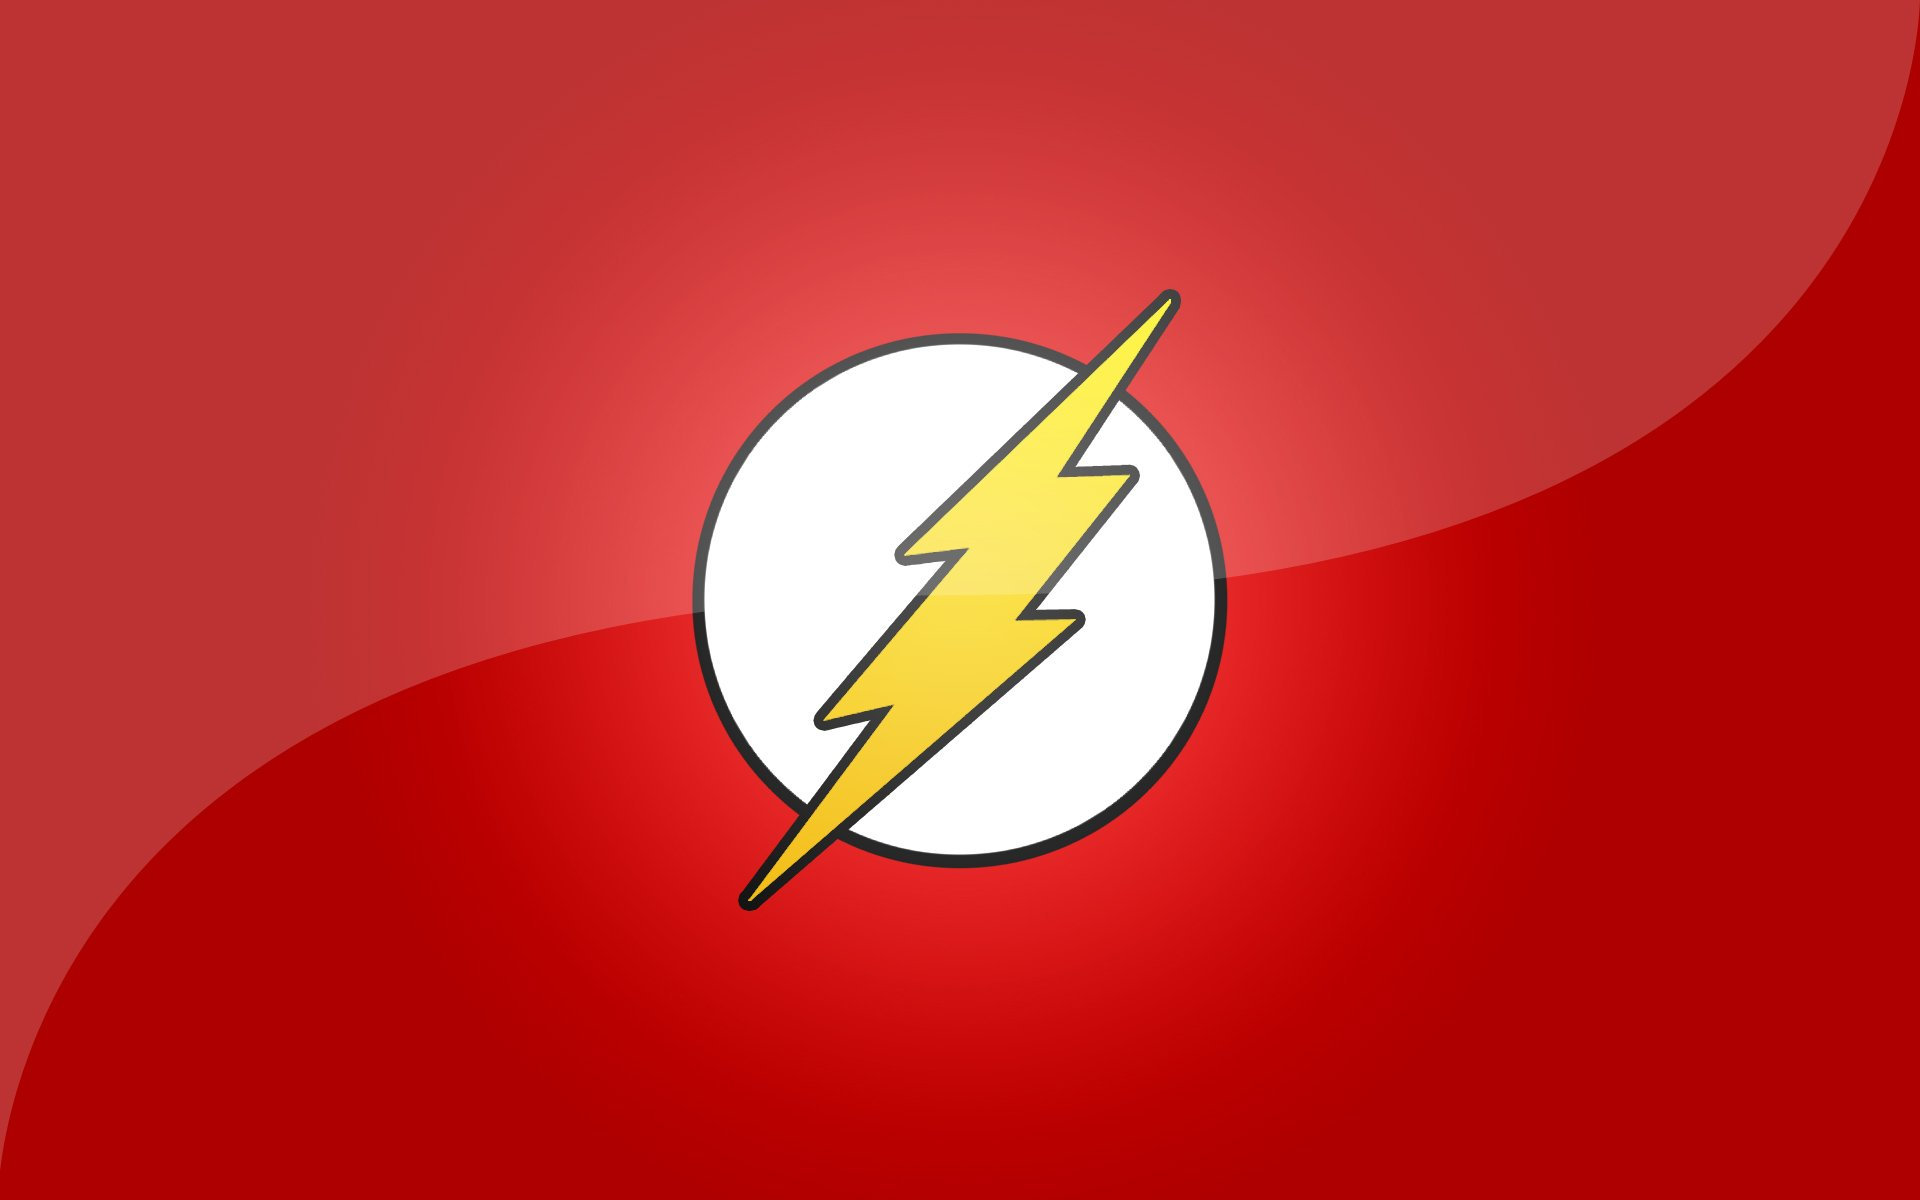 dc Comics Superheroes dc Comics The Flash Logos